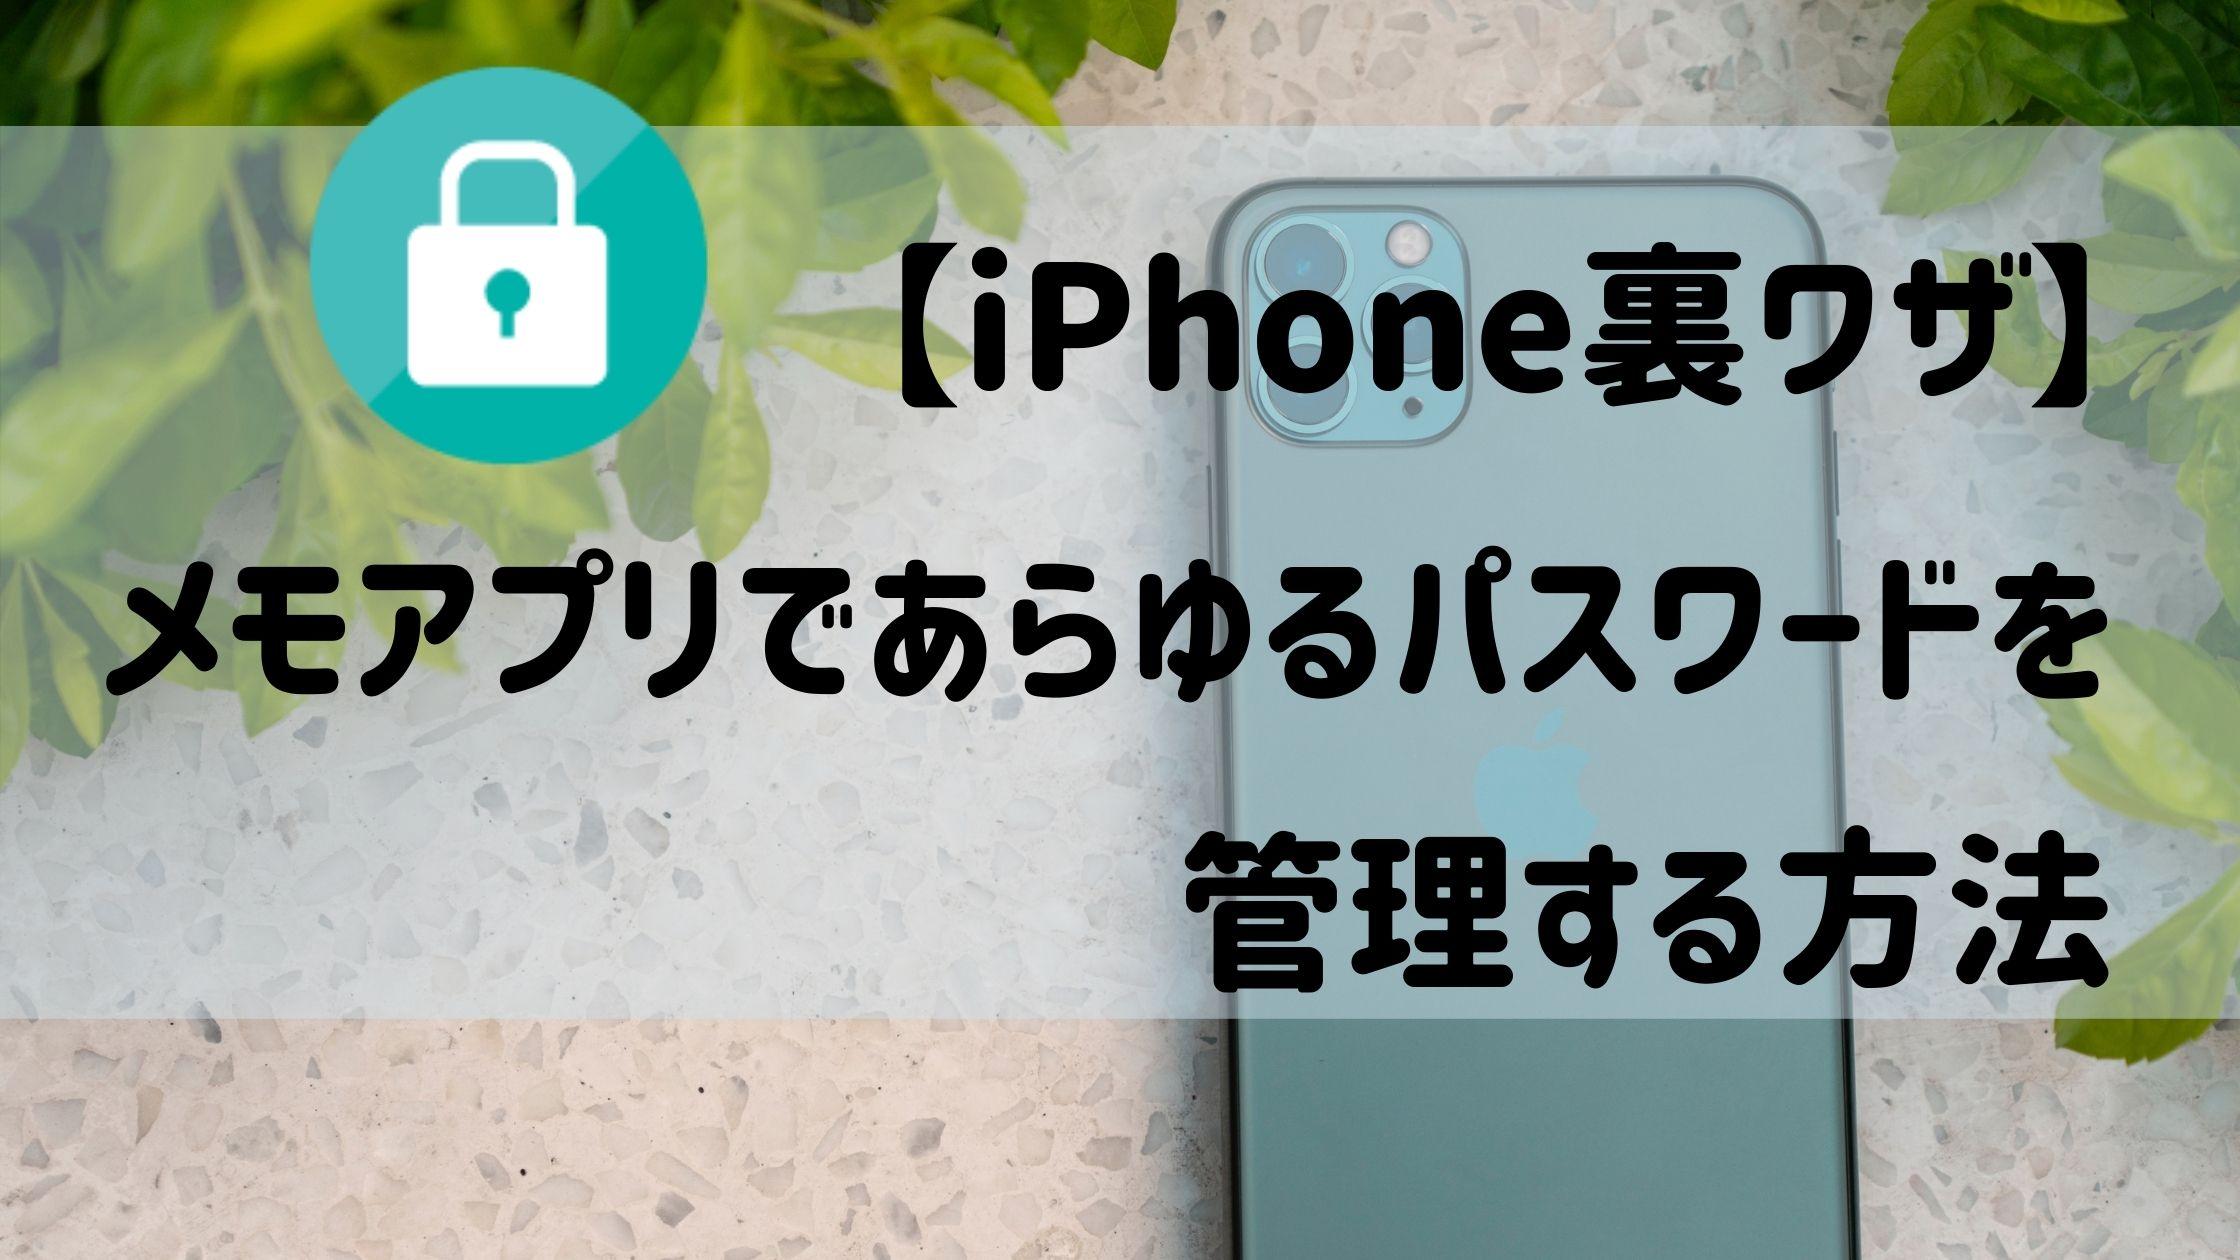 iPhone 裏ワザ パスワード ライフハック メモ アプリ